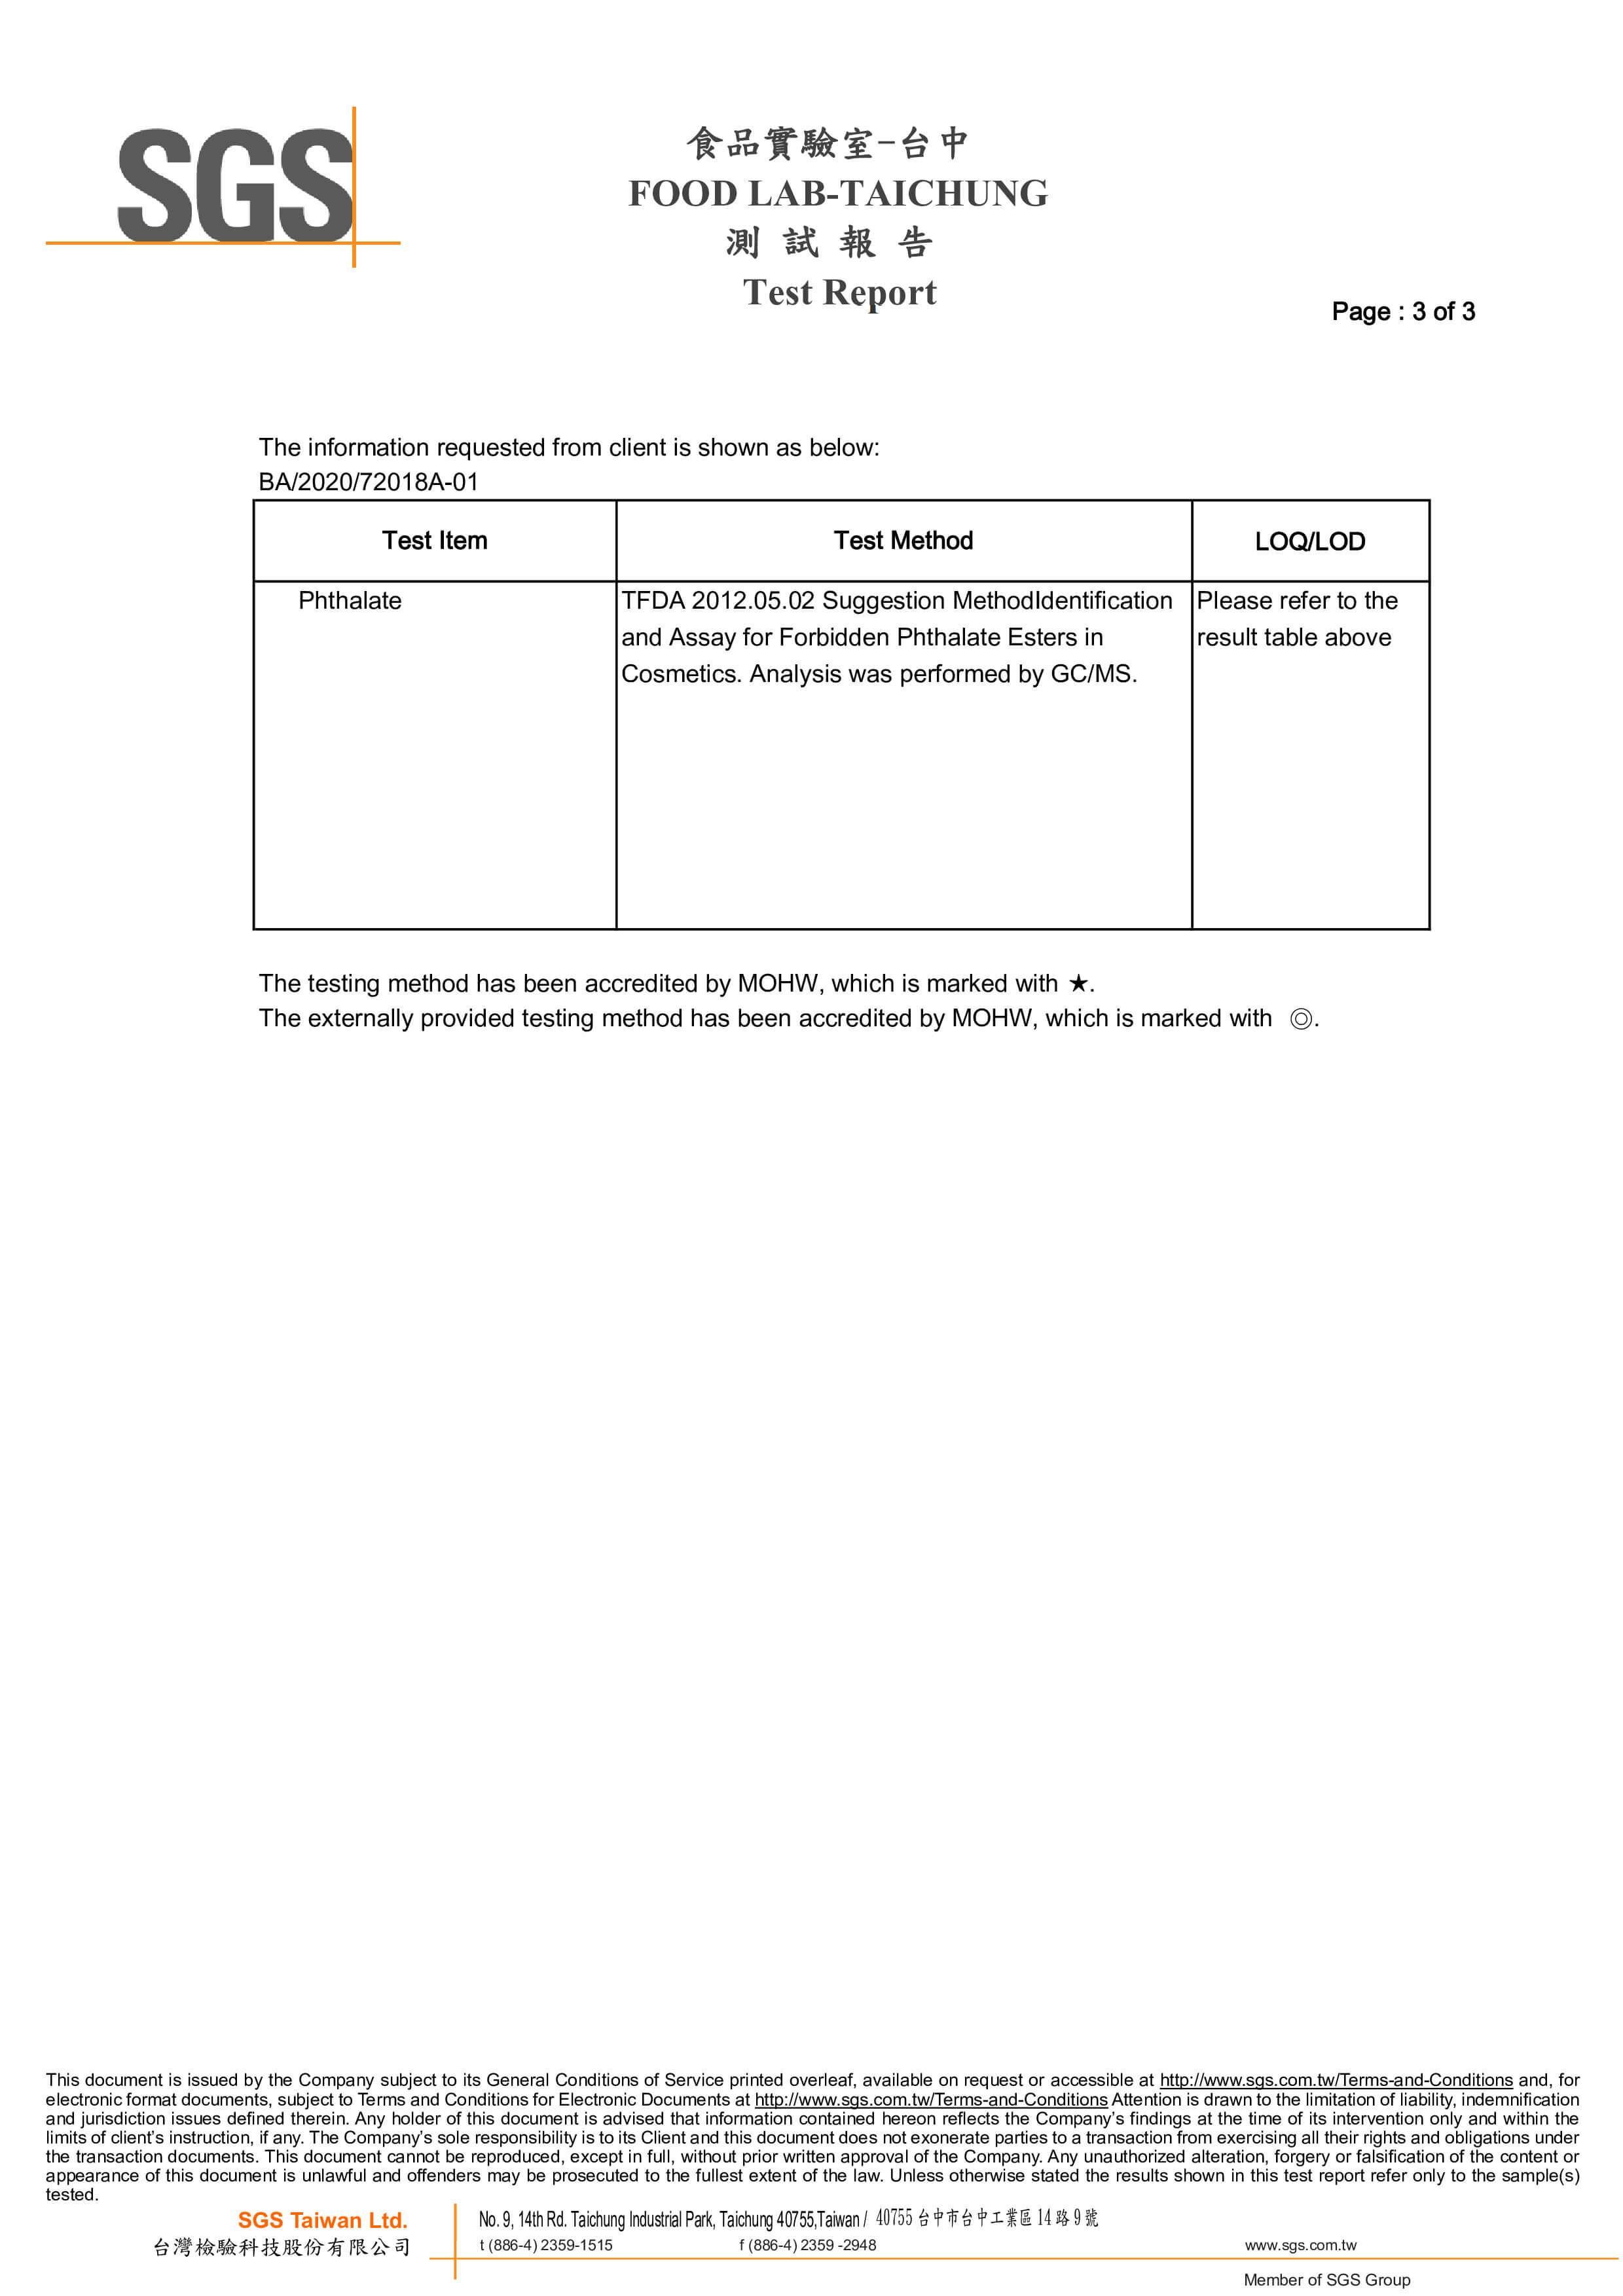 SGS Test Report No.2 p3-3